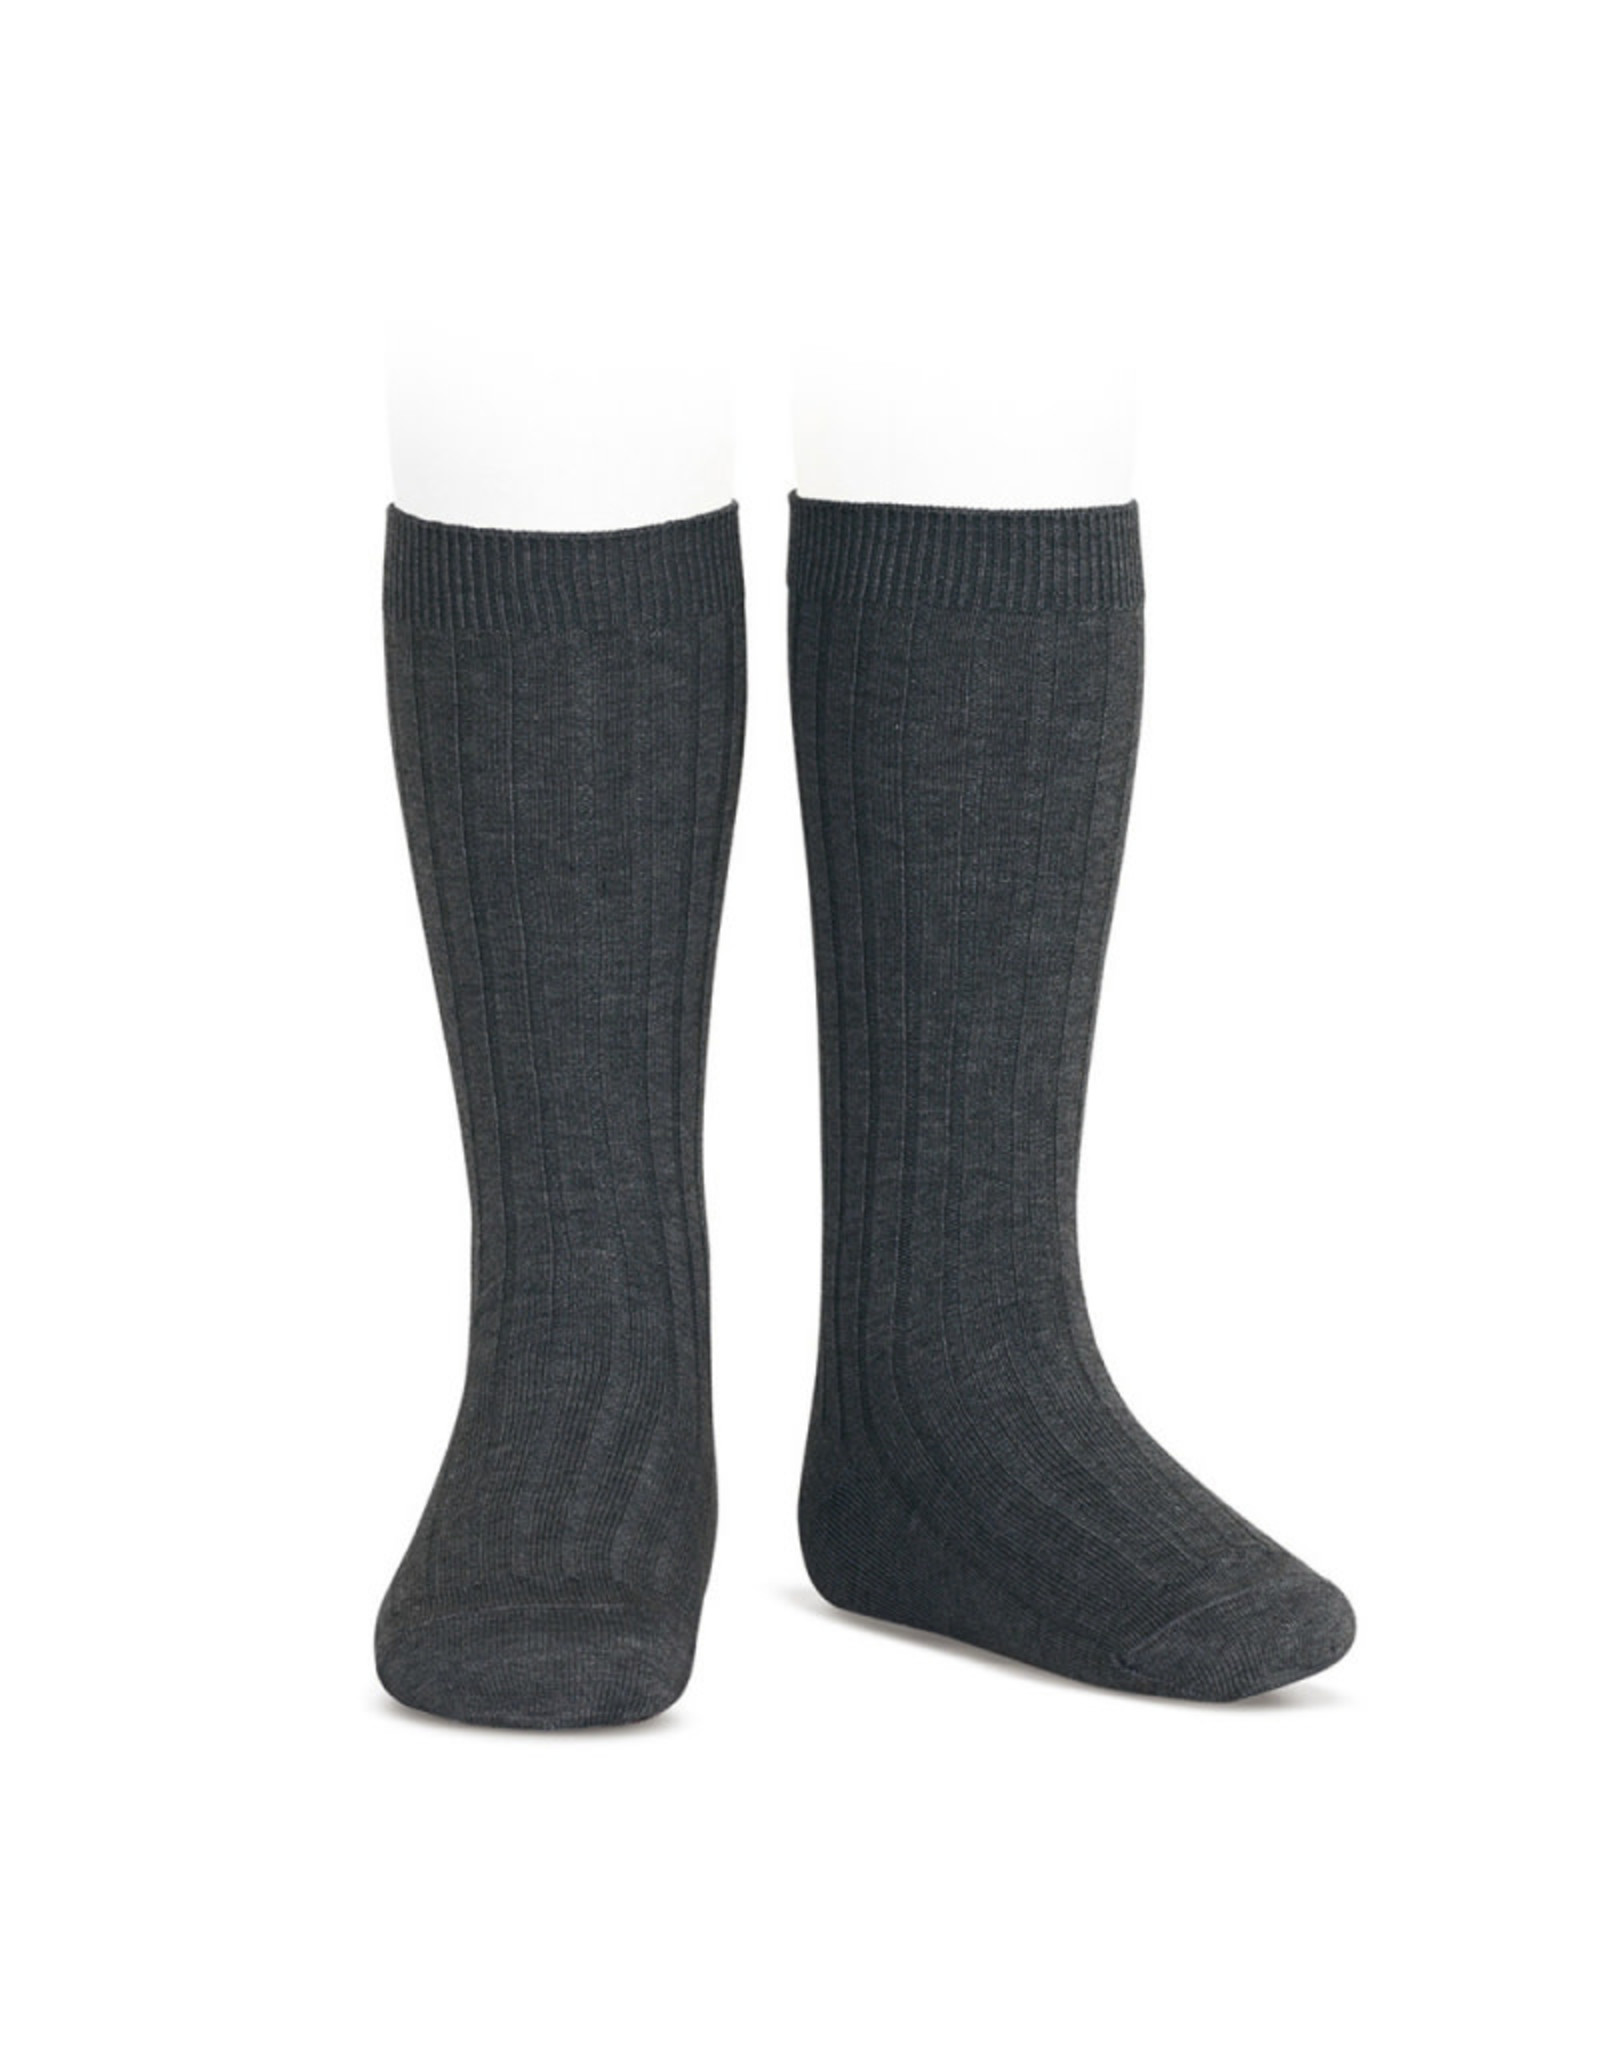 CONDOR Anthracite Ribbed Knee Socks